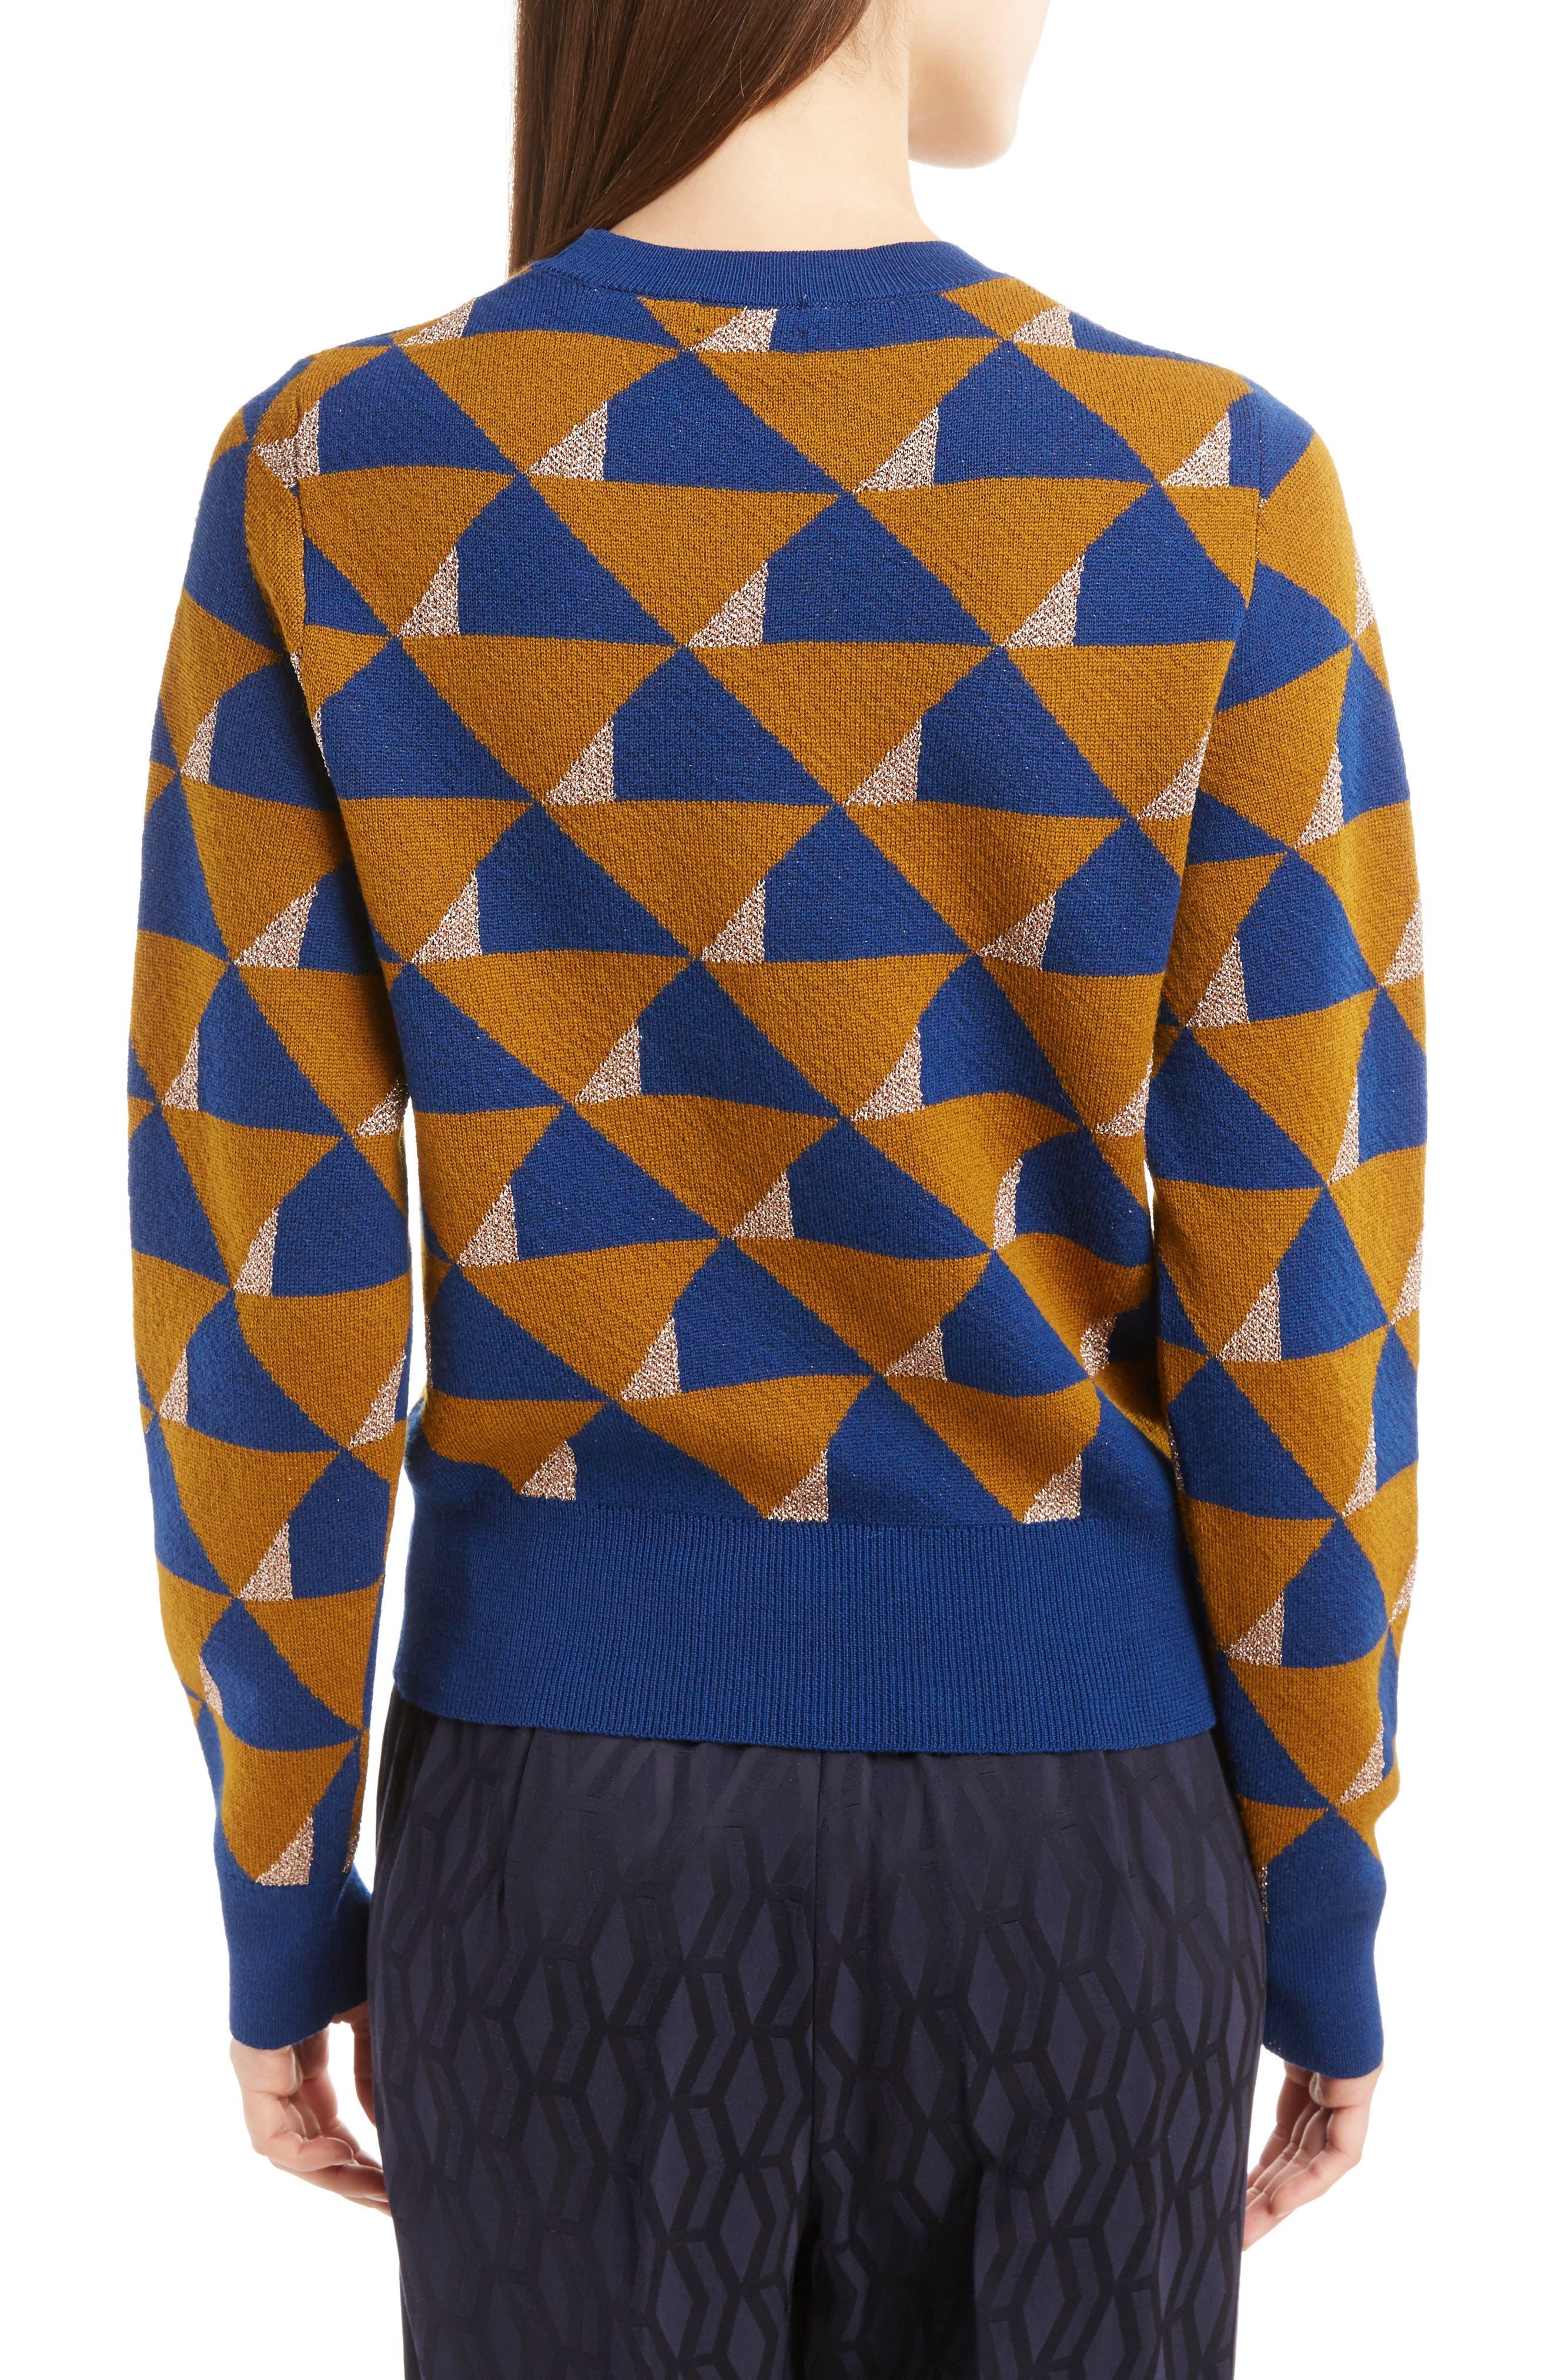 Graphic Knit Merino Wool Sweater,                             Alternate thumbnail 2, color,                             Ocra